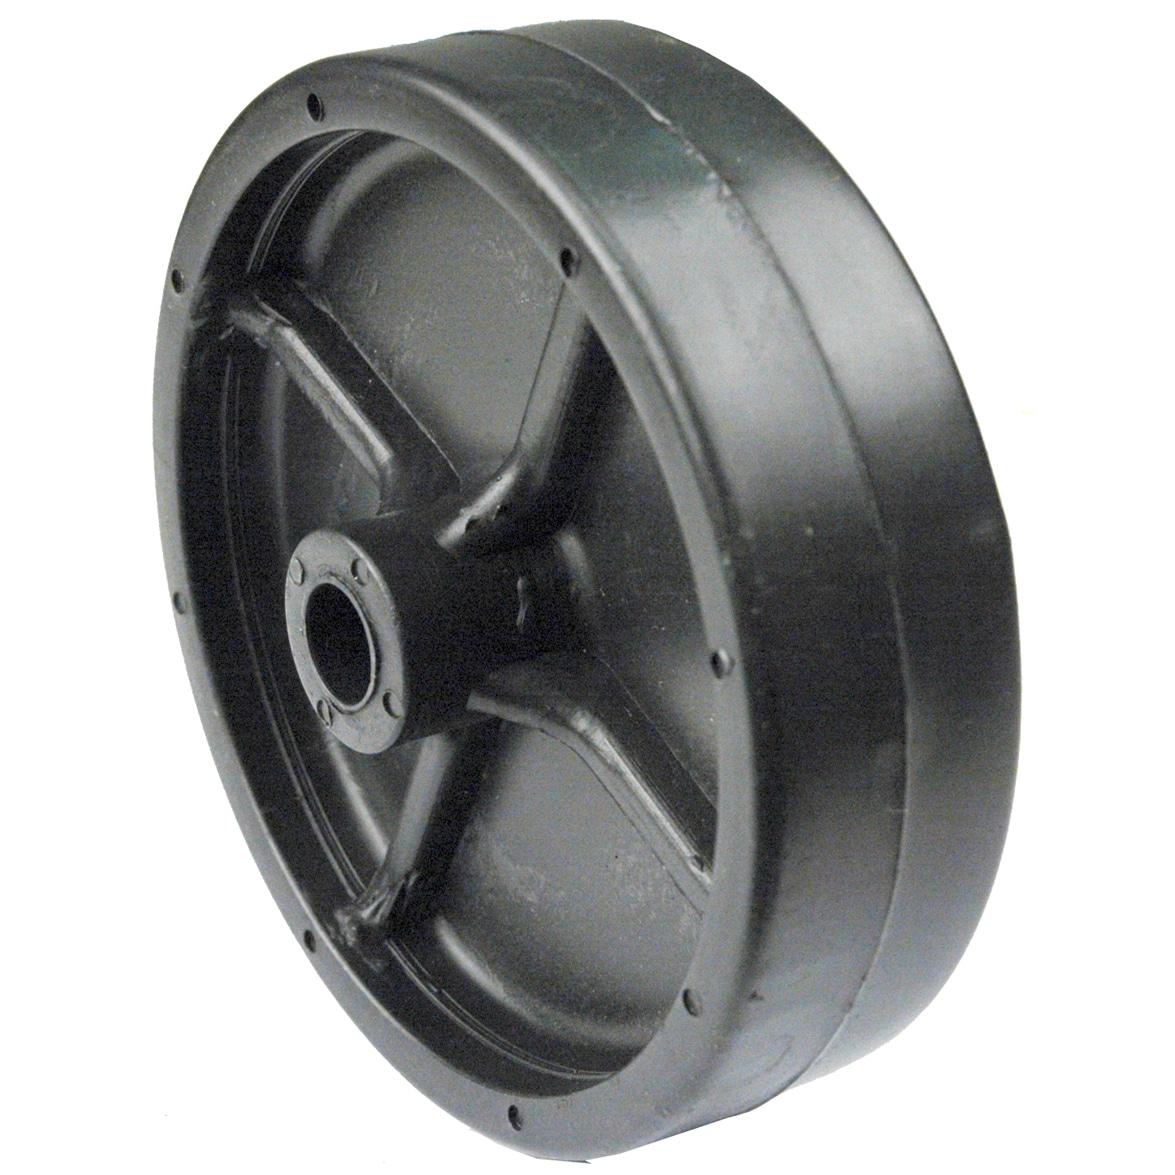 Maxpower 335095 5 inches x 1-3/8 Inches MTD Deck Wheel (L...